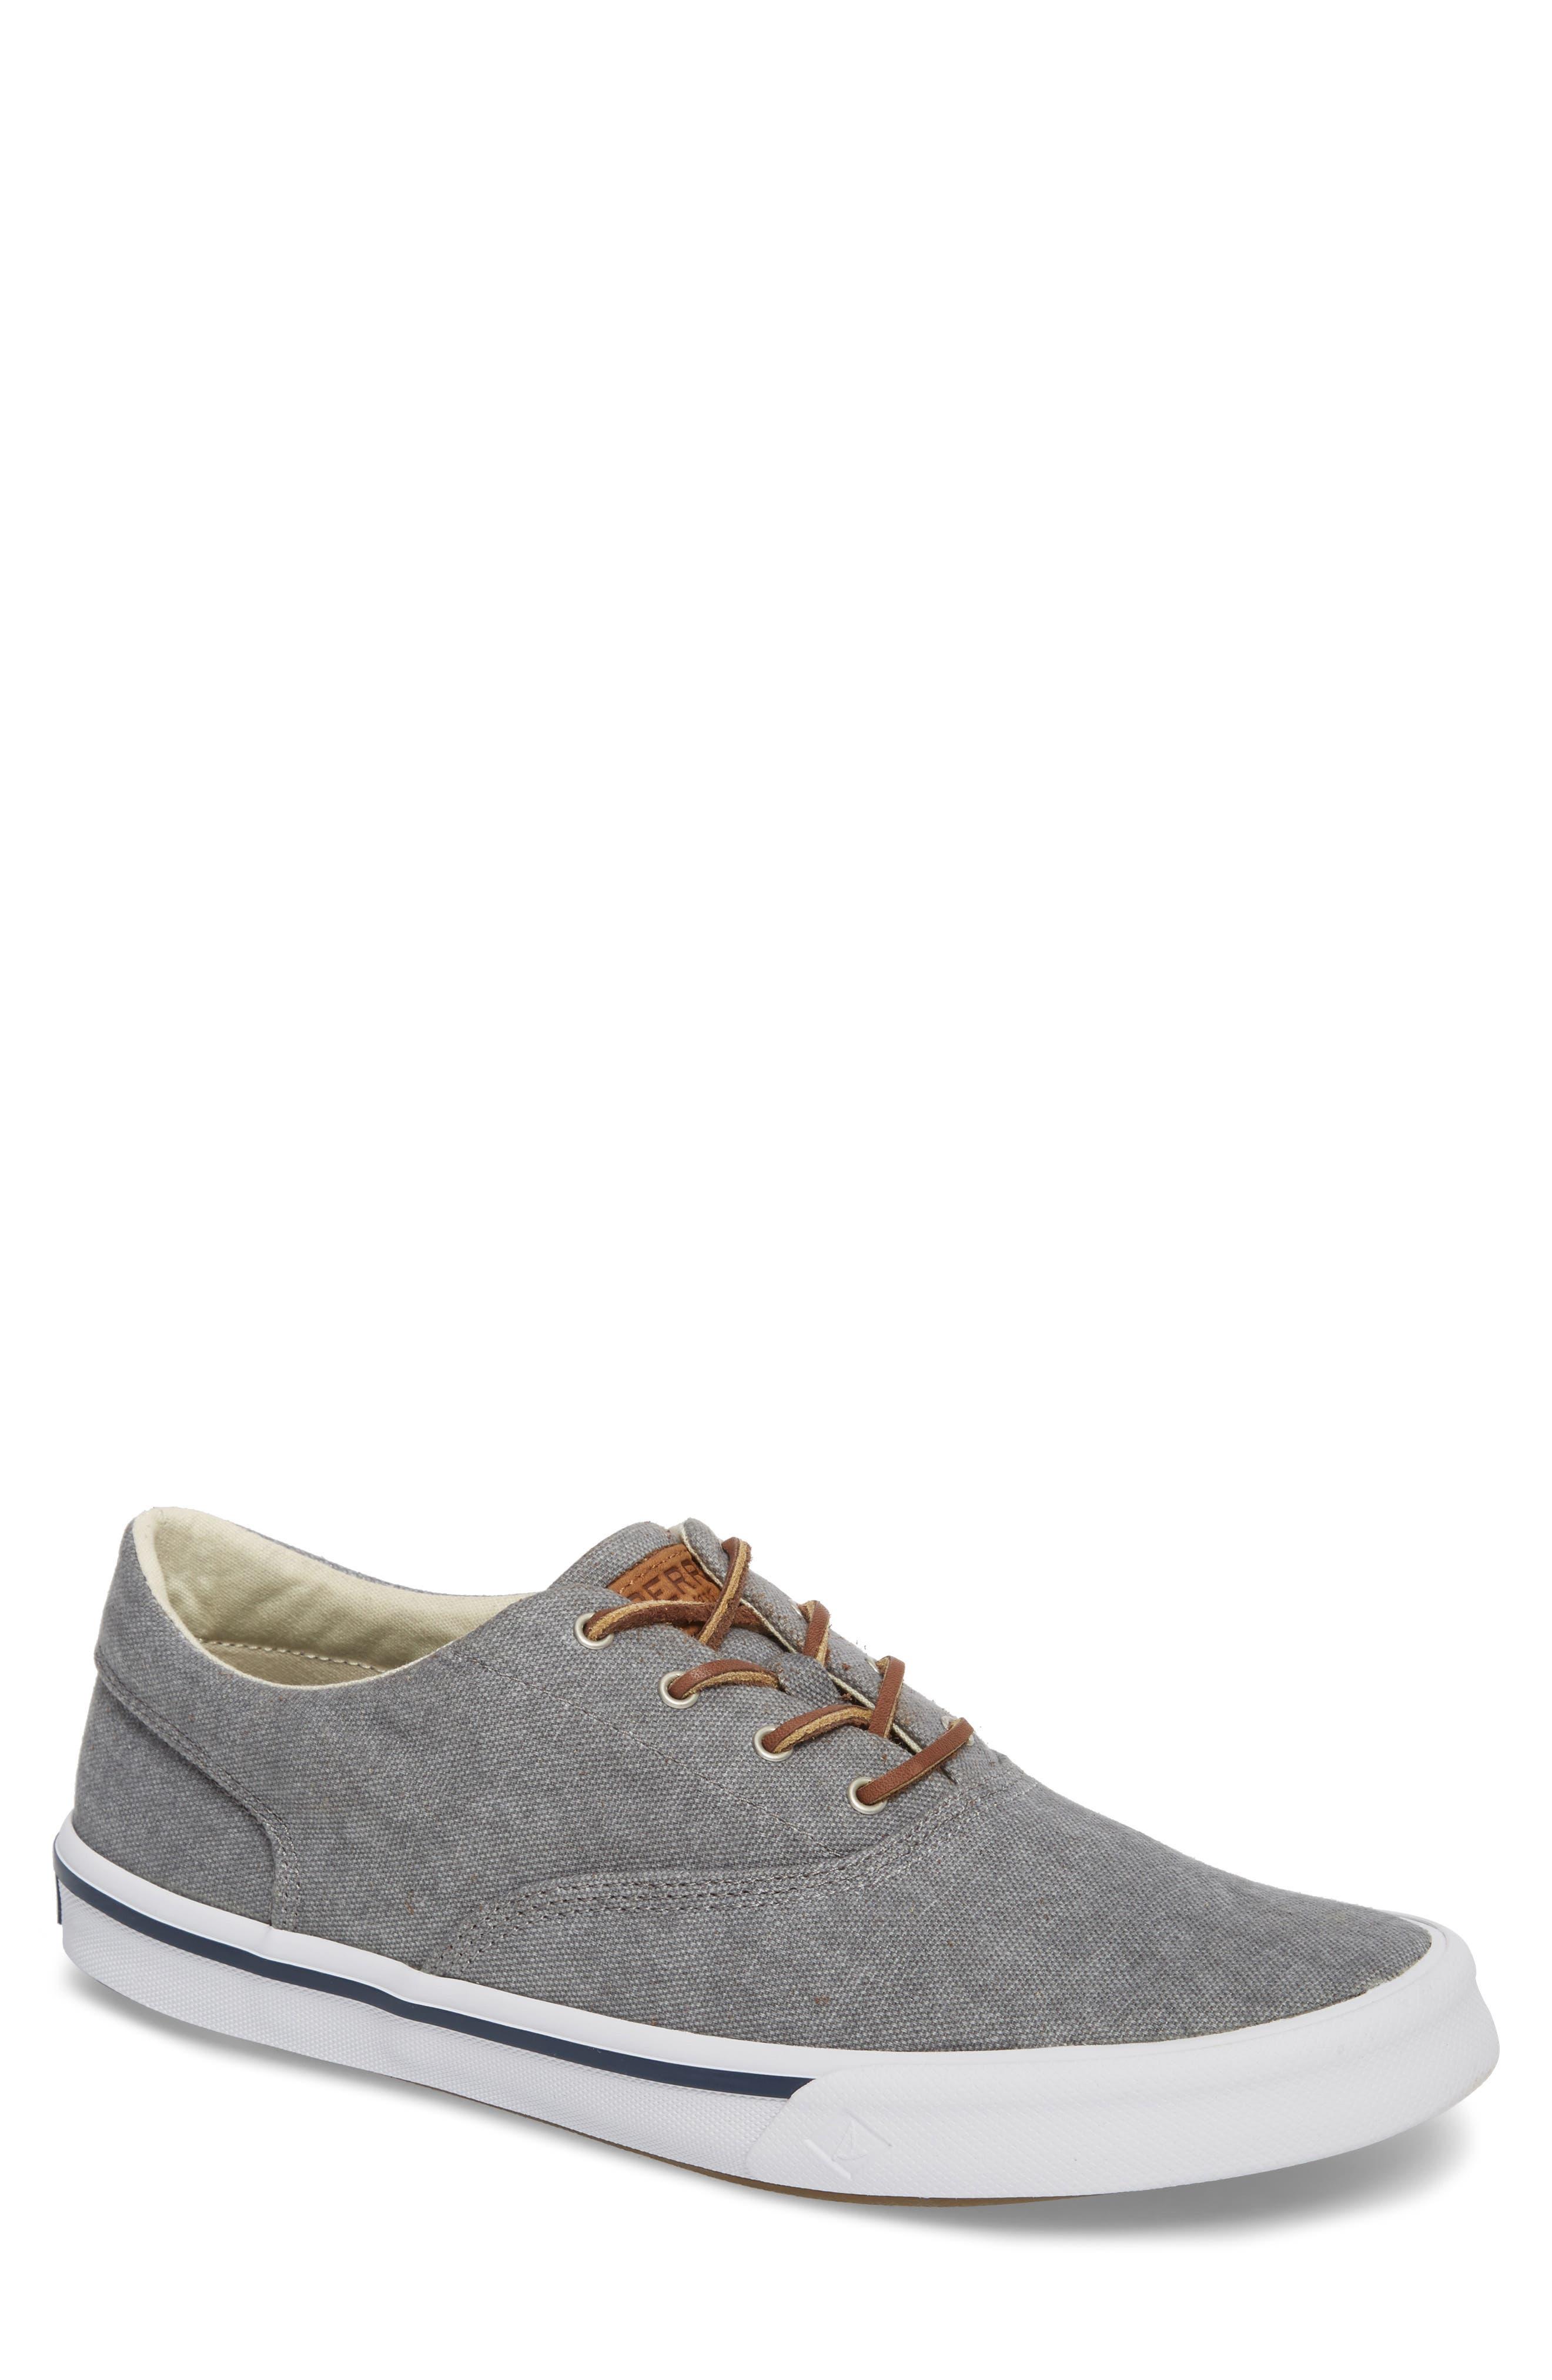 Sperry Striper 2 CVO Sneaker (Men)